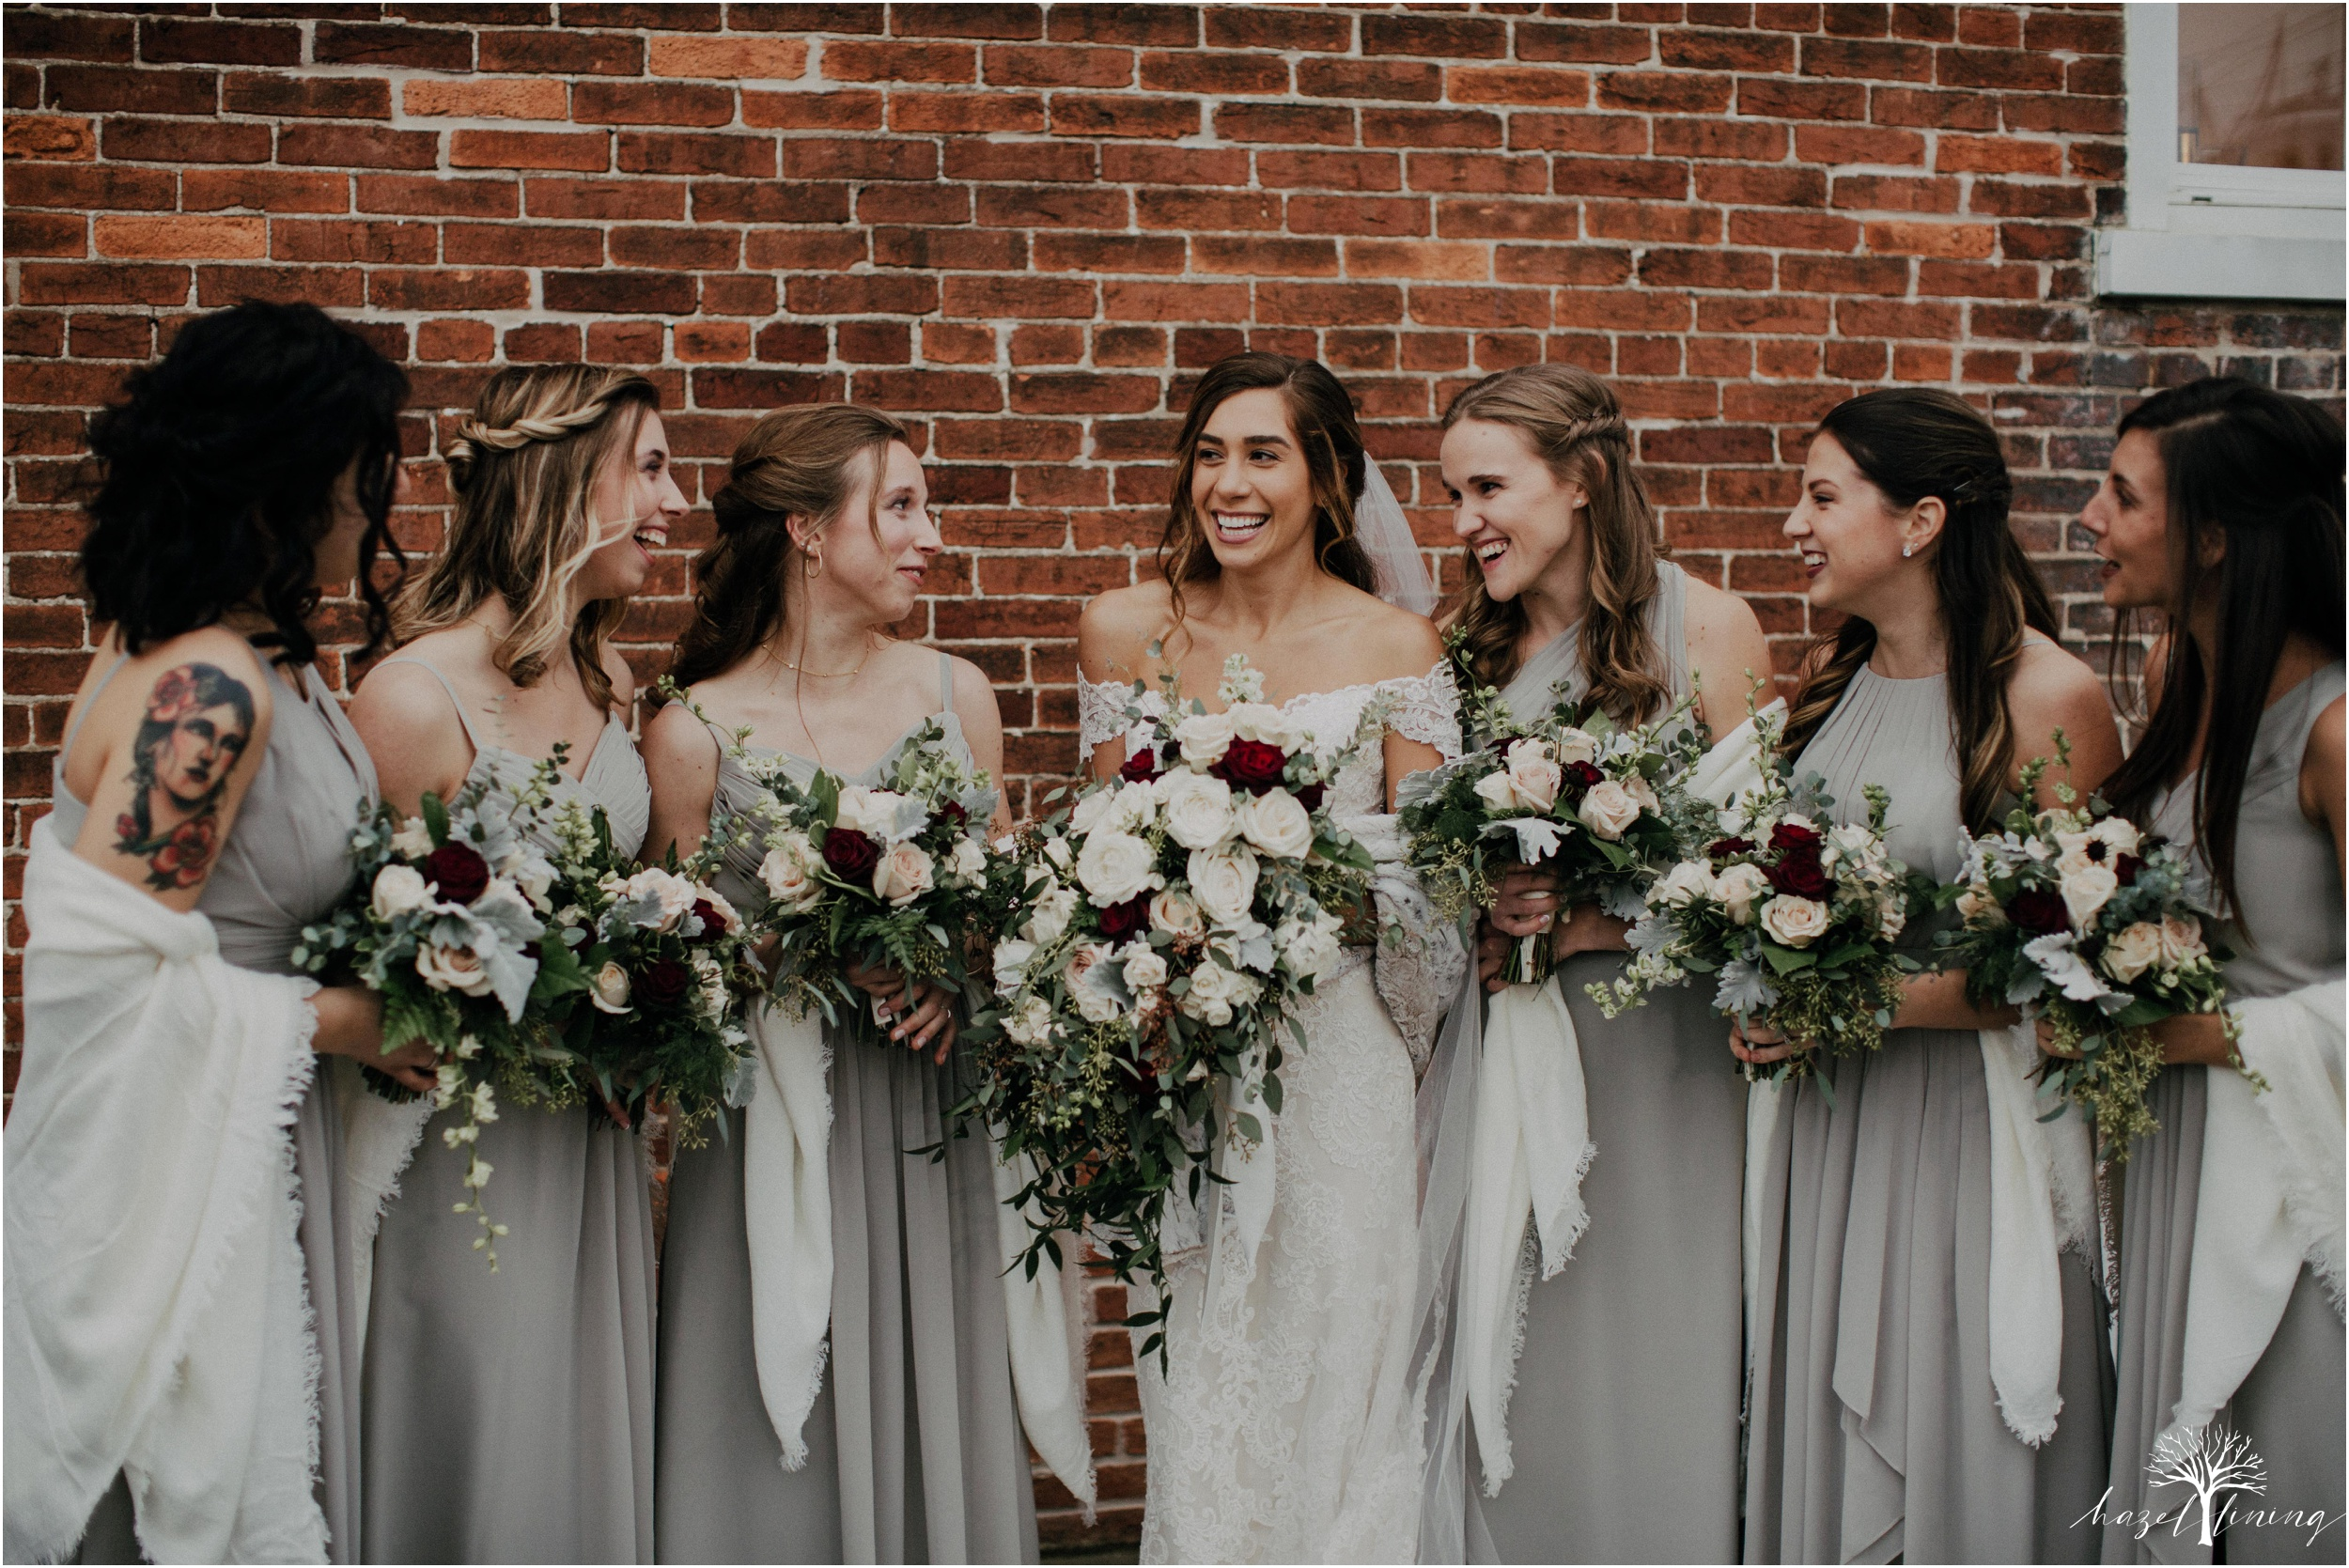 emma-matt-gehringer-the-booking-house-lancaster-manhiem-pennsylvania-winter-wedding_0076.jpg